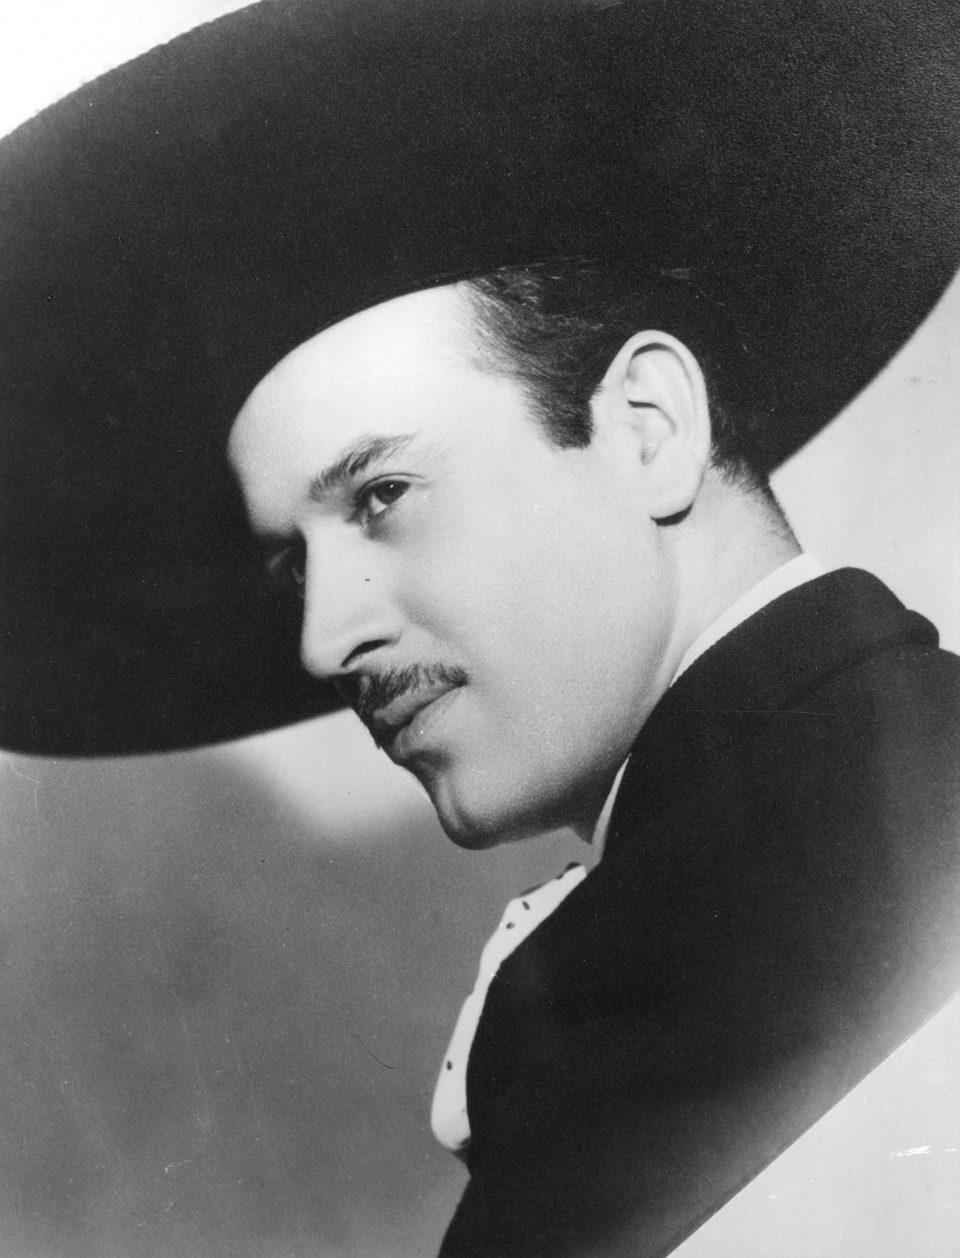 Sale la primera imagen de Omar Chaparro como Pedro Infante